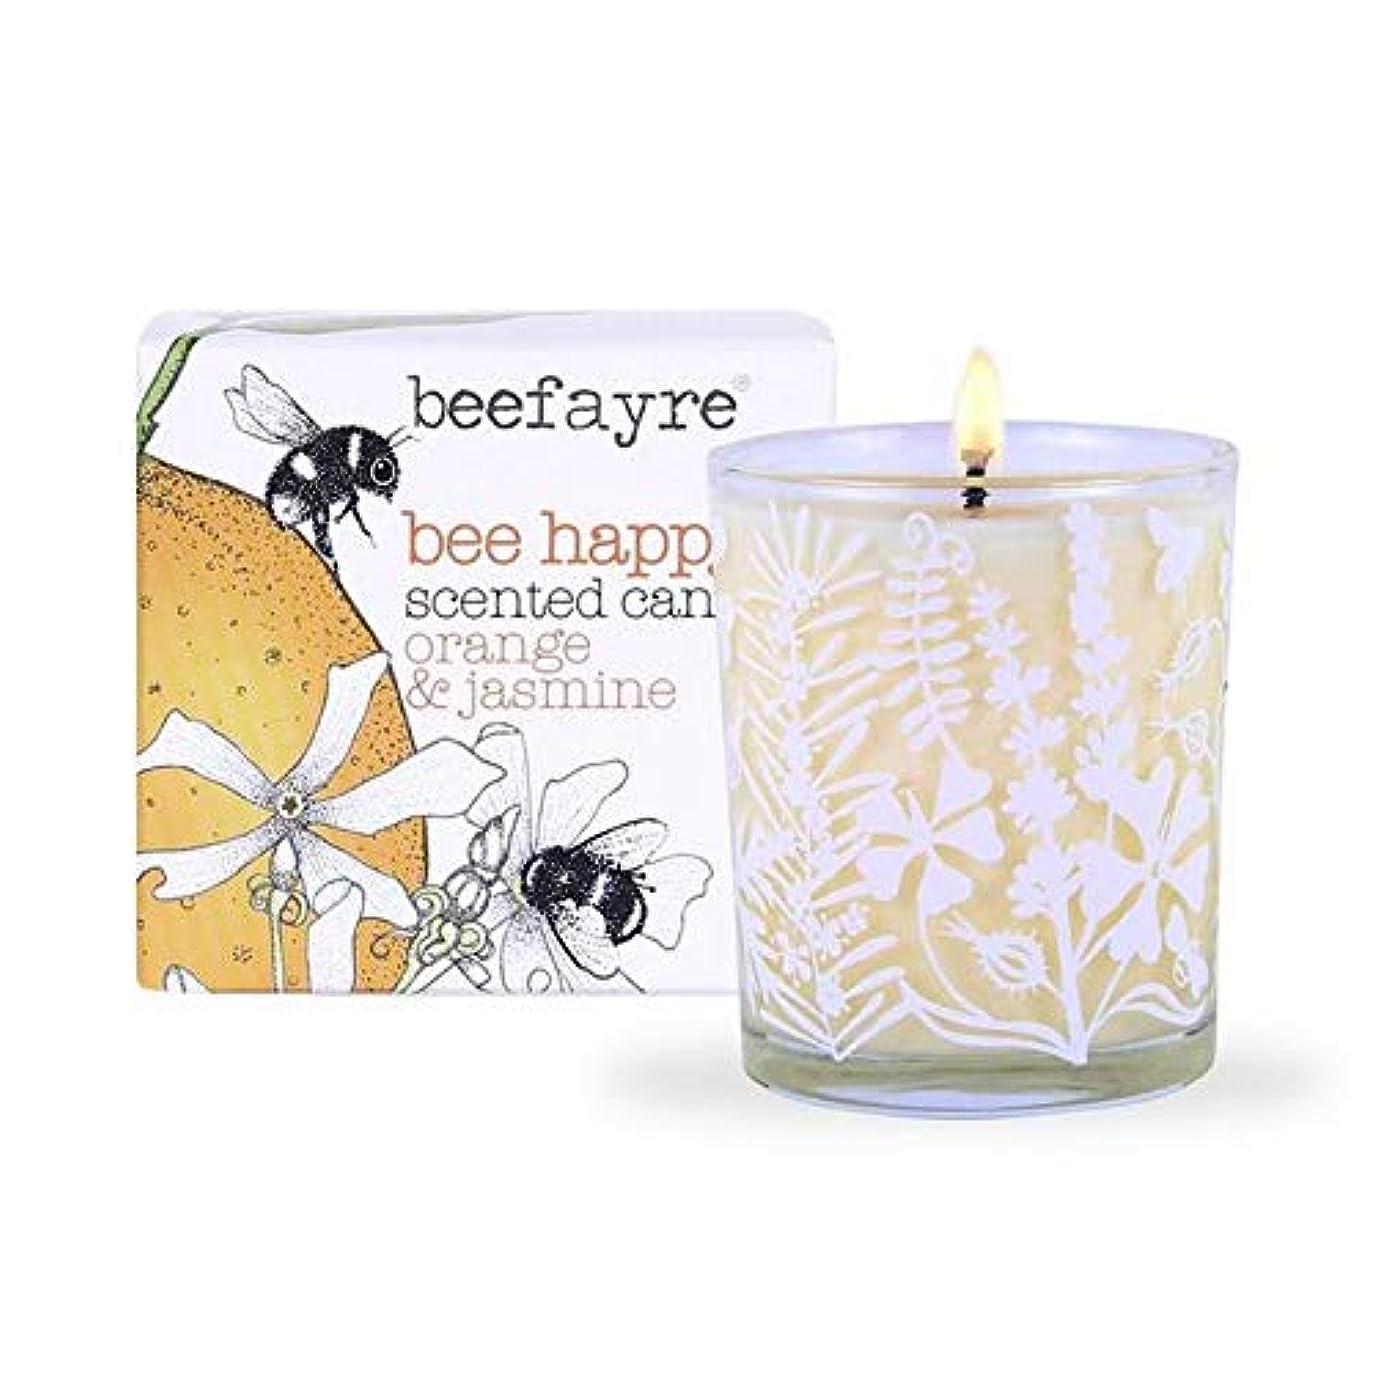 [Beefayre] オレンジ&ジャスミンの香りのキャンドル9Cl Beefayre - Beefayre Orange & Jasmine Scented Candle 9cl [並行輸入品]